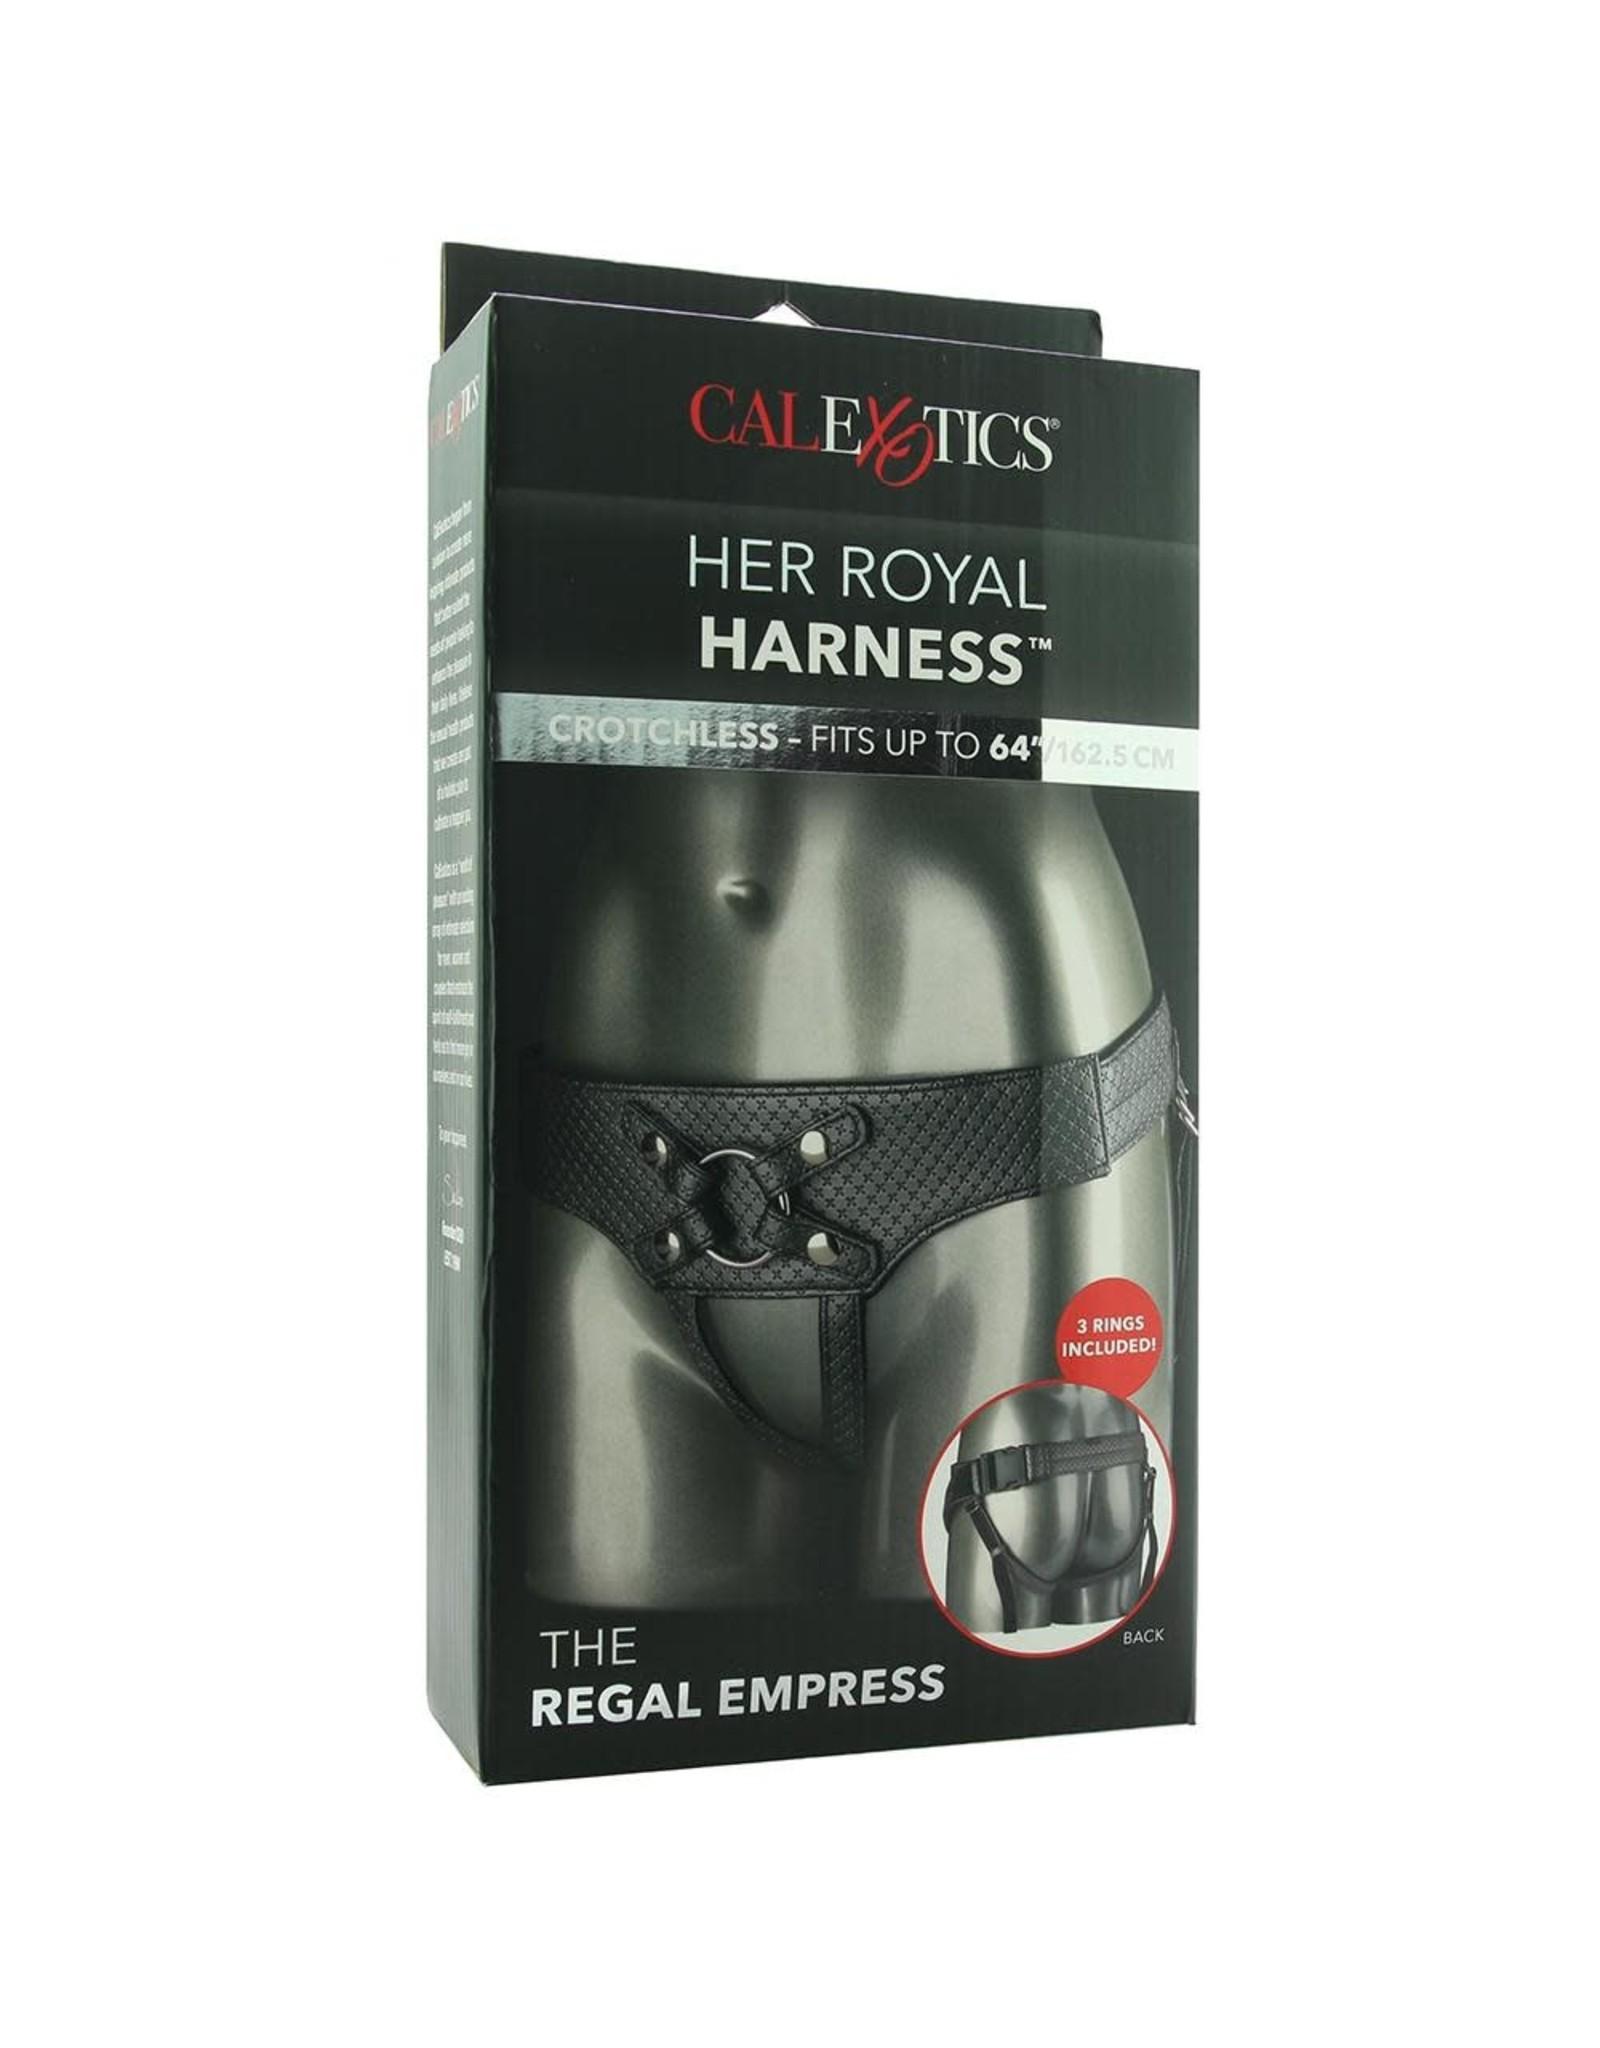 Calexotics Her Royal Harness The Regal Empress (Pewter)